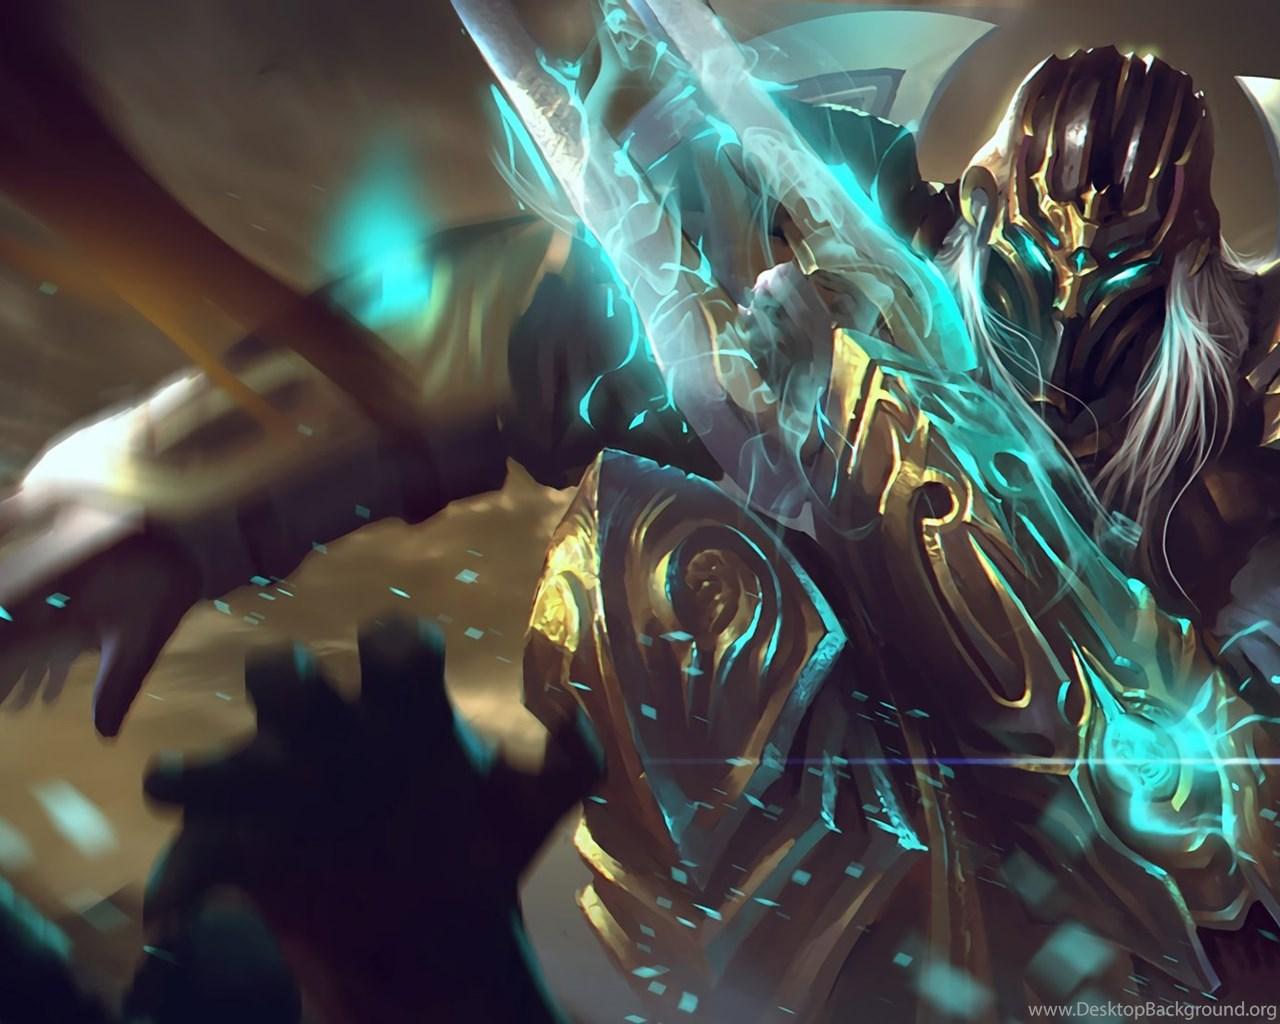 League Of Legends Wallpaper 4k 1280x1024 Rocki Wallpaper